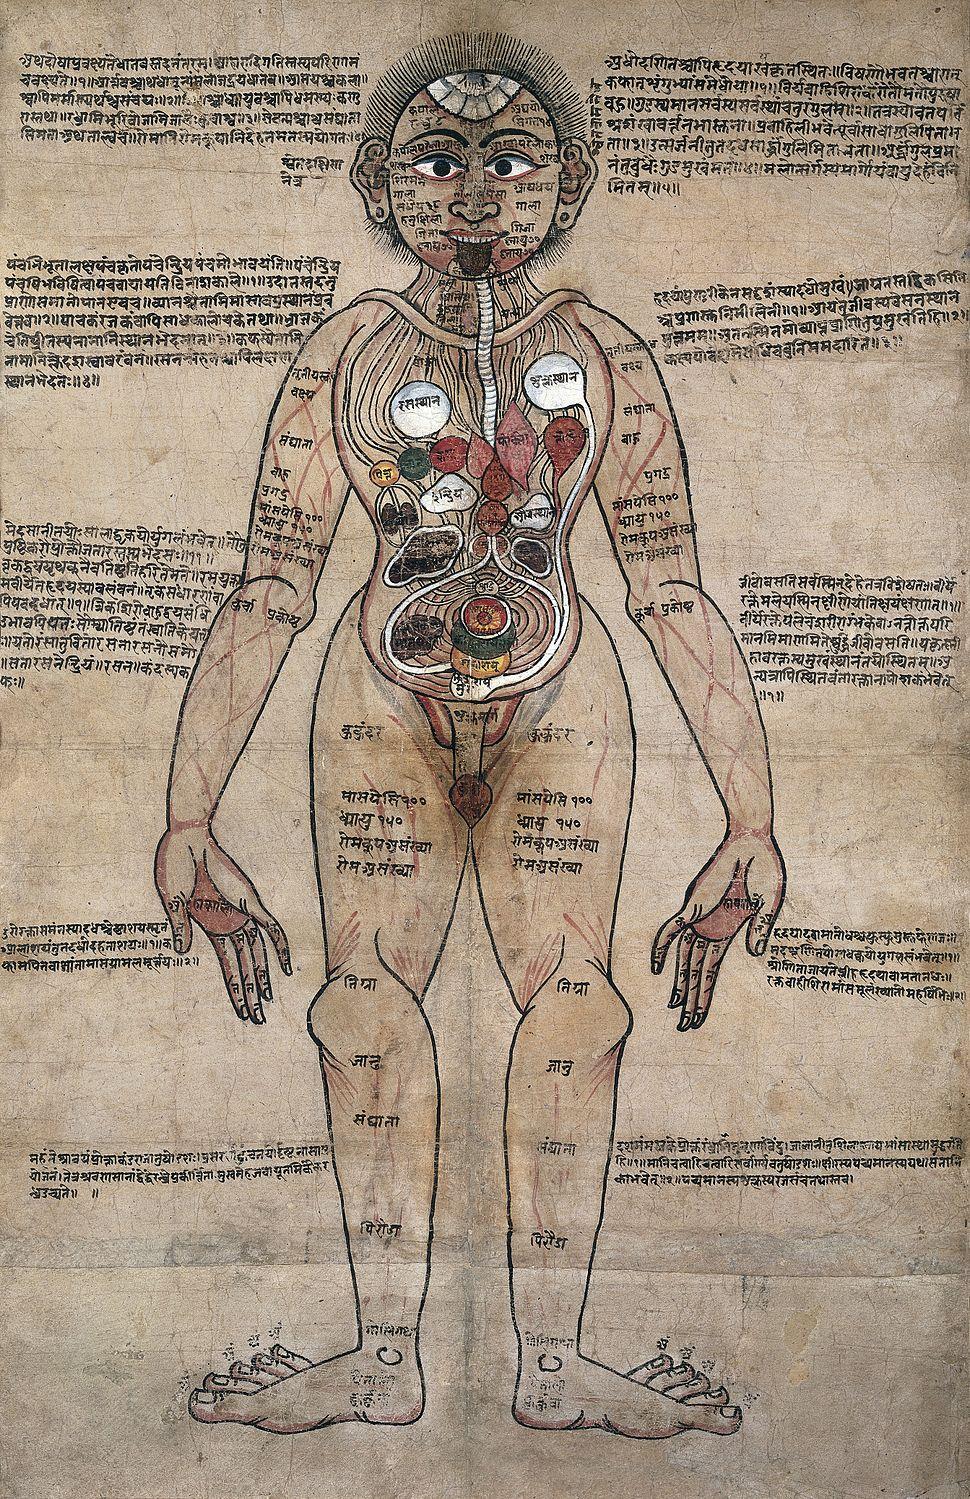 The Ayurvedic Man., c.18th century Wellcome L0017592